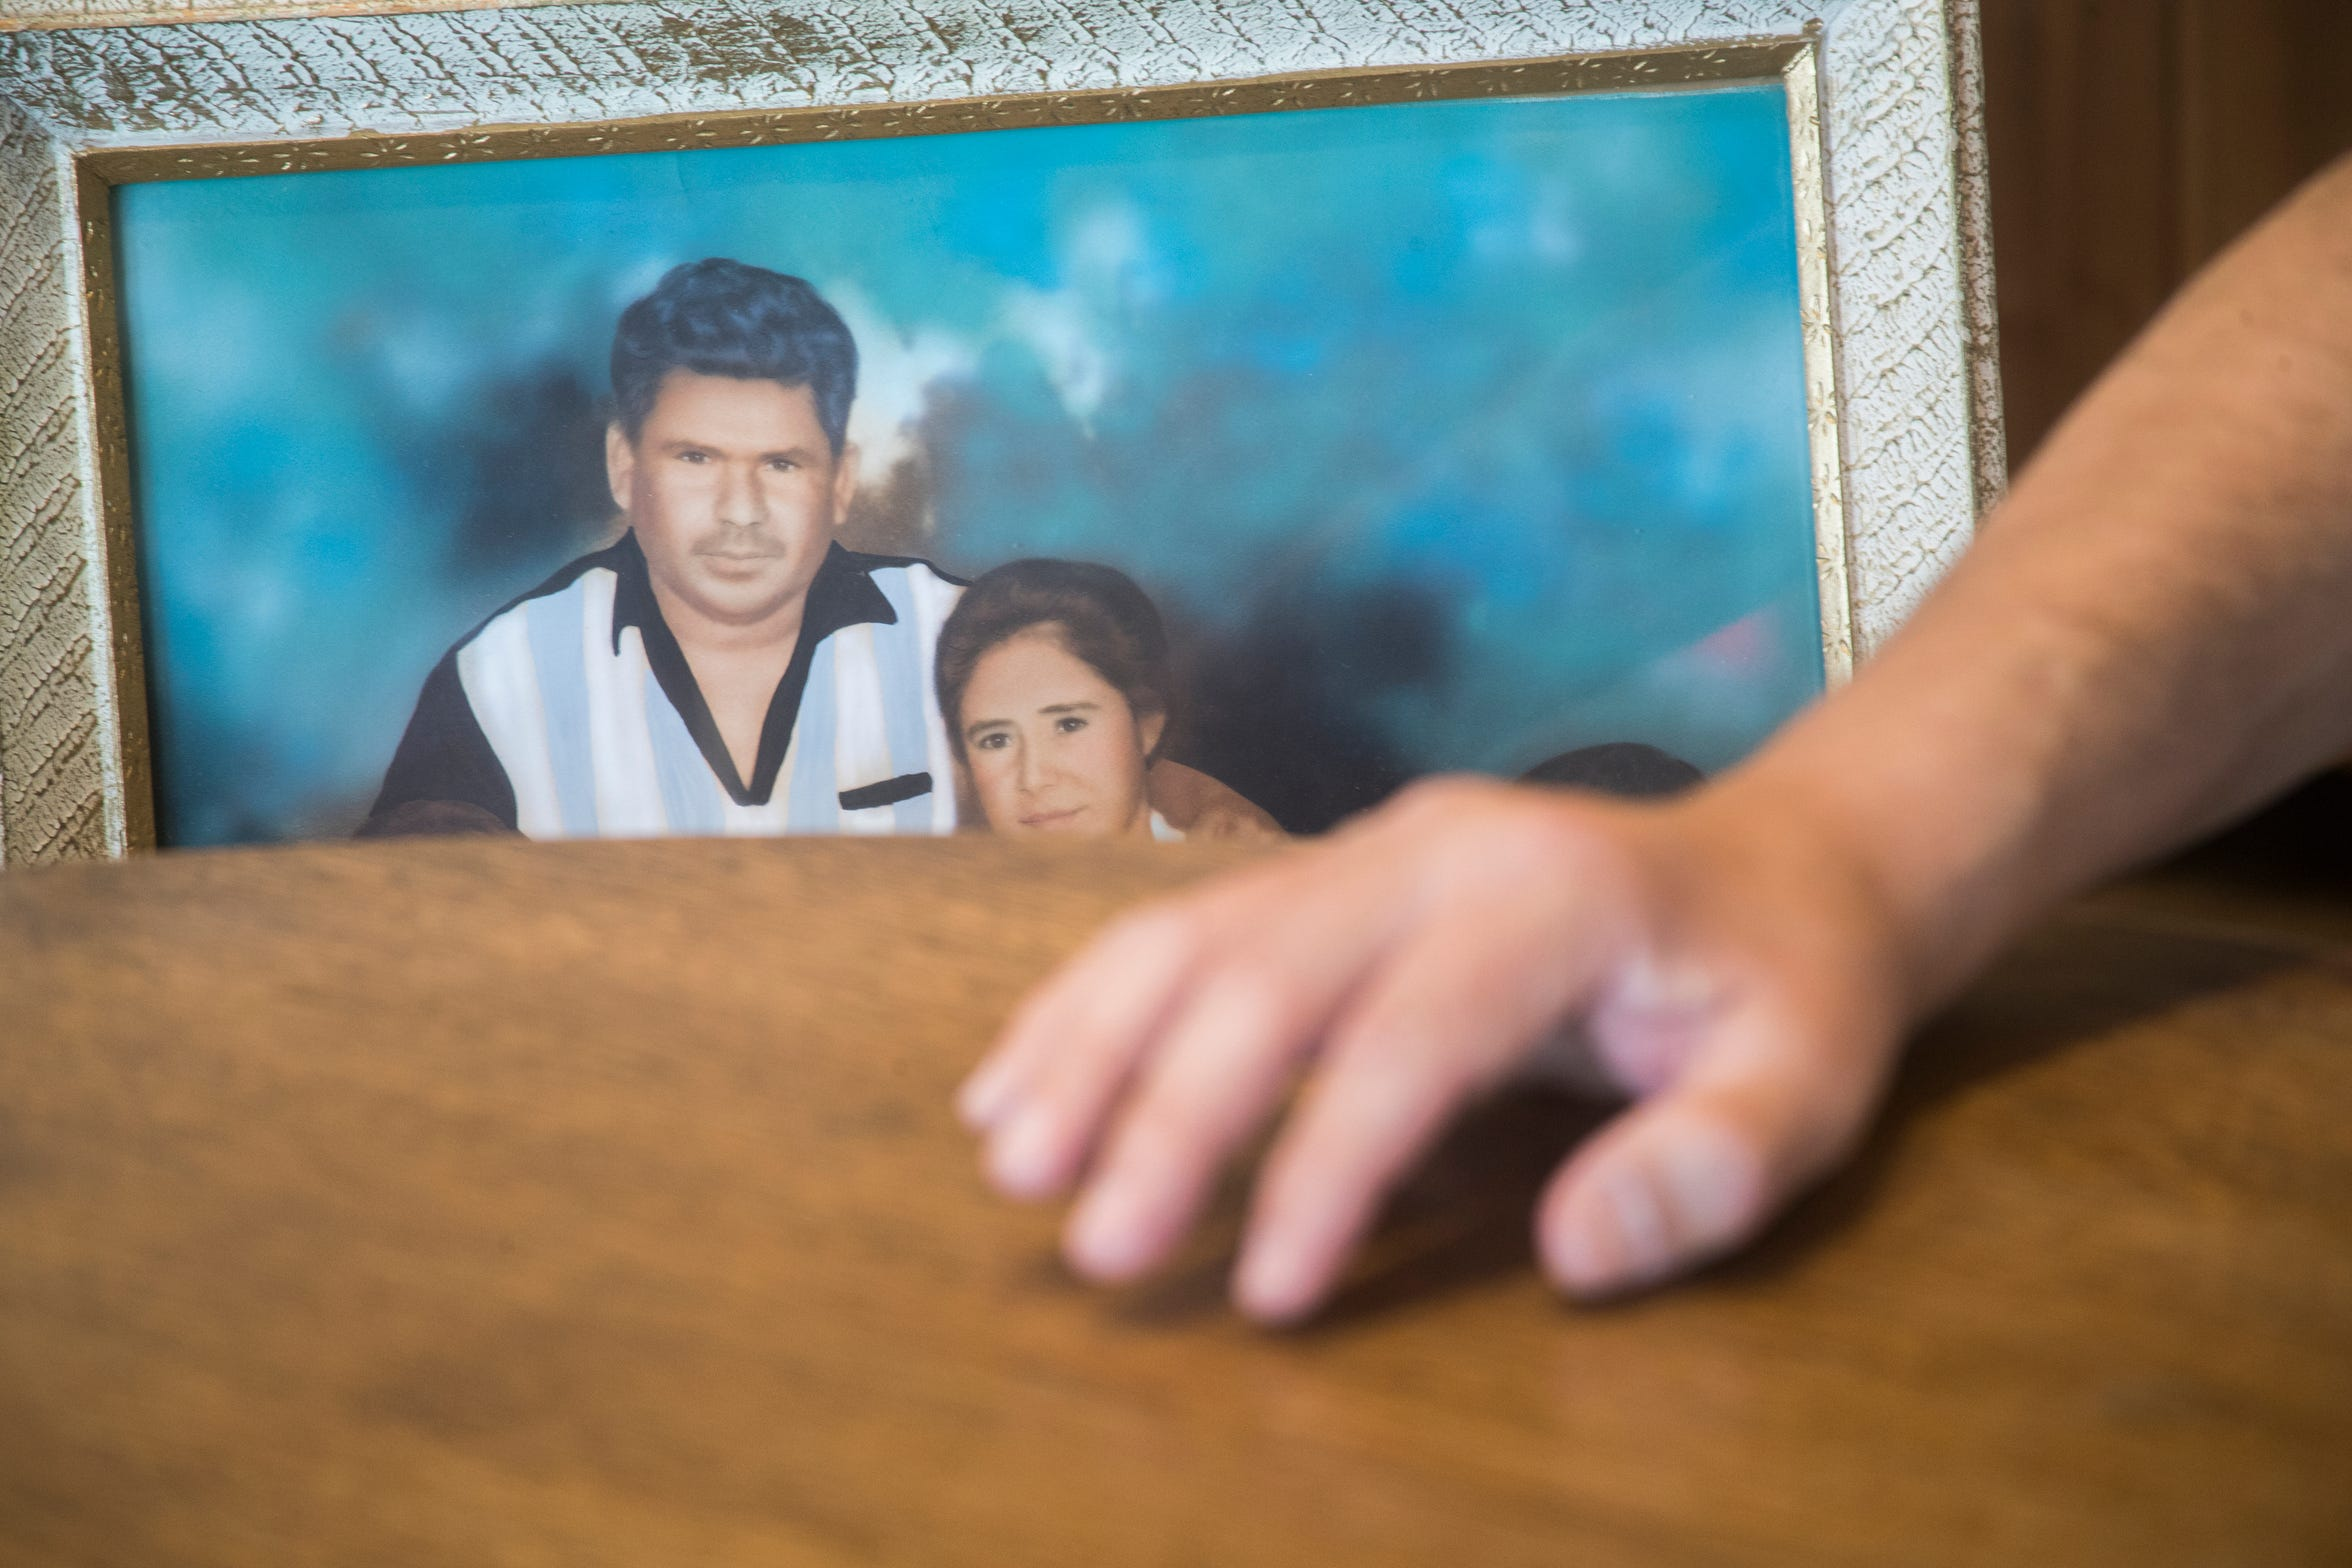 Jesus Manuel Guzman studies a painting of his parents, Manuel Mendoza and Guadalupe Guzman. Manuel died in the 1974 farmworker bus crash.